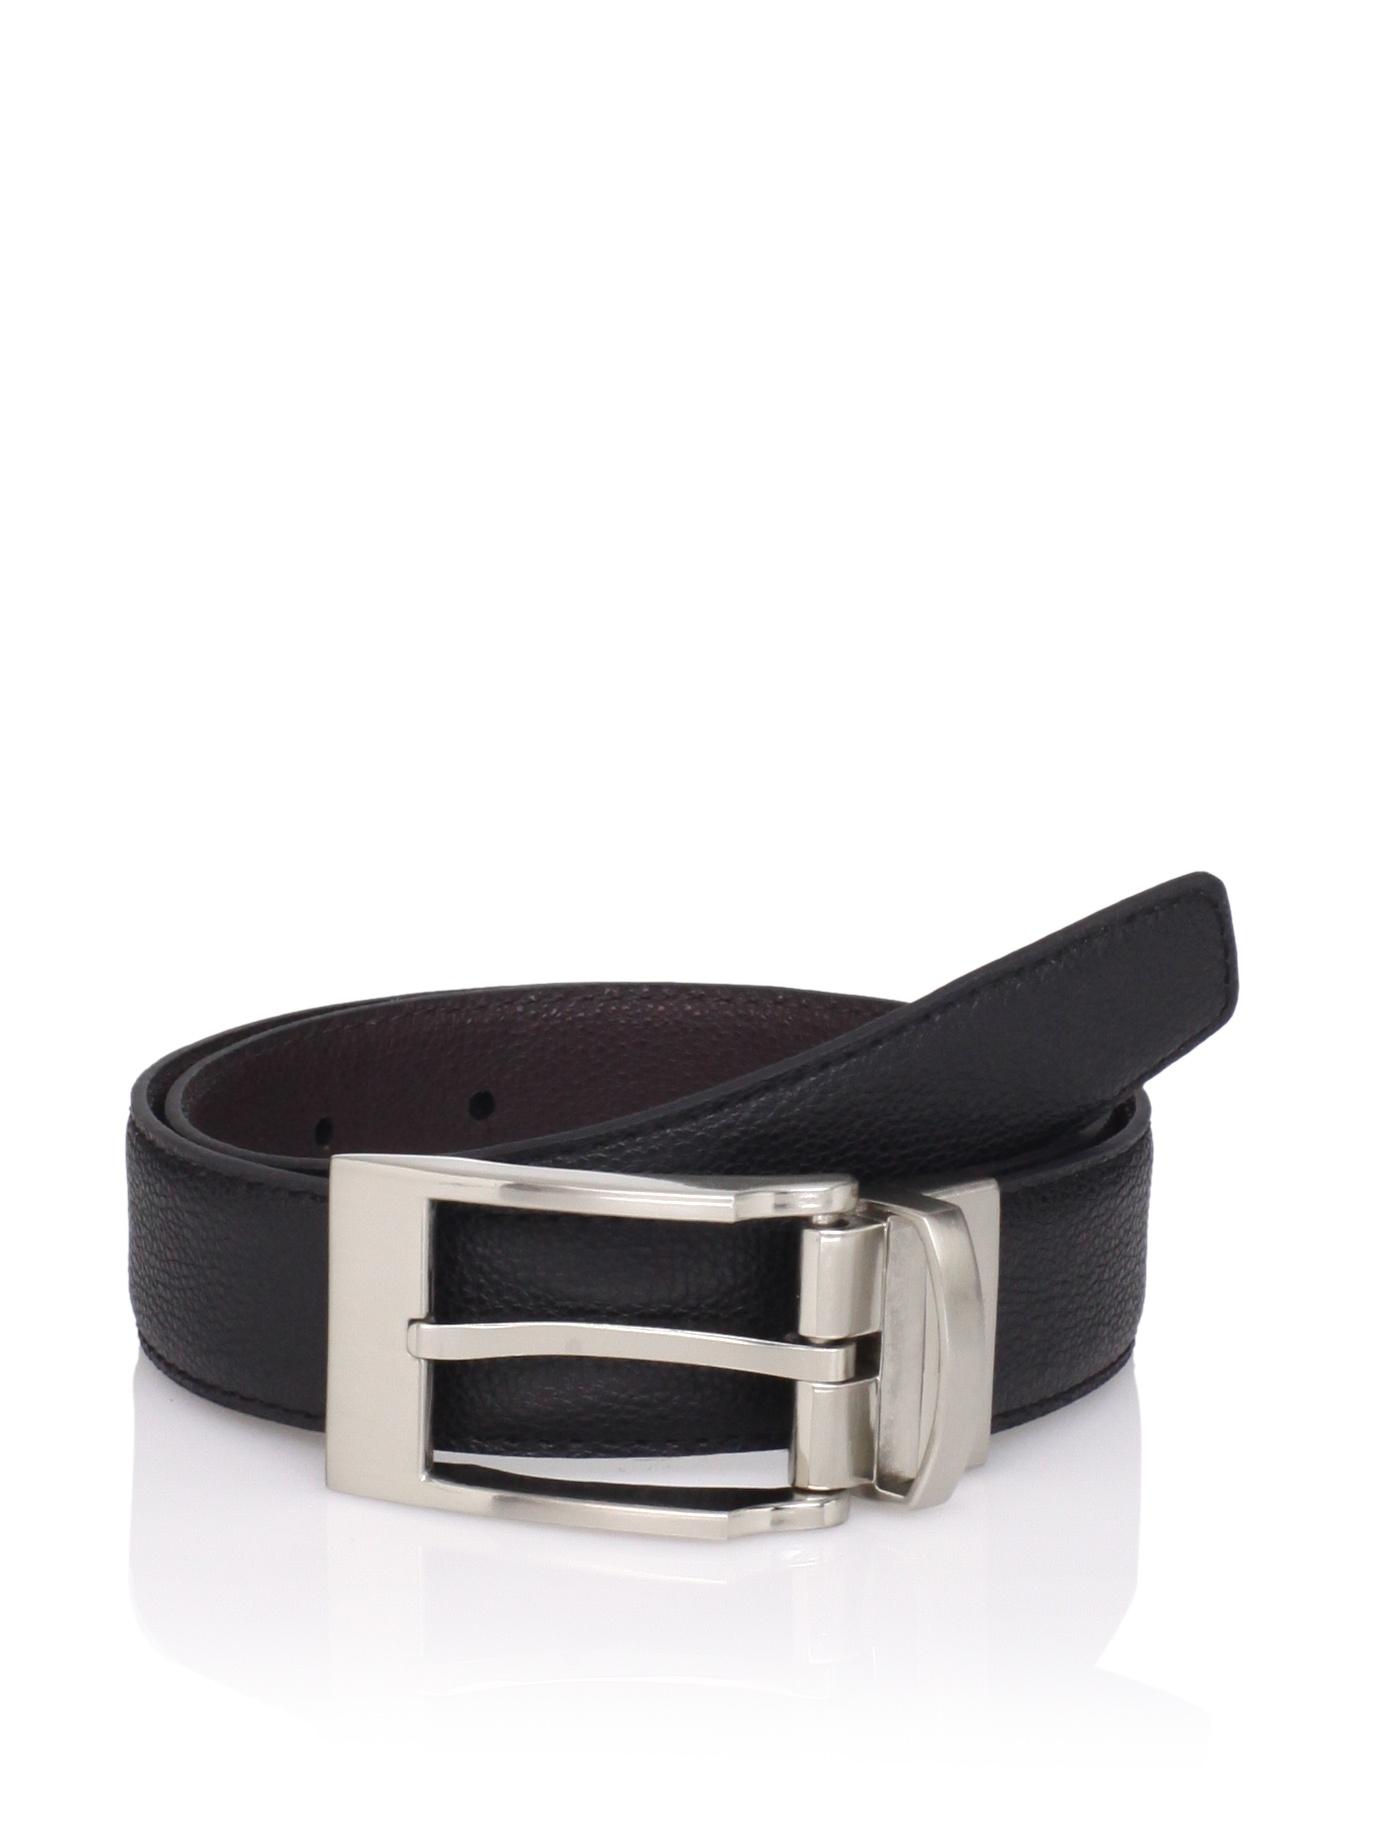 Ike Behar Boy's Pebbled Reversible Belt (Black/brown)